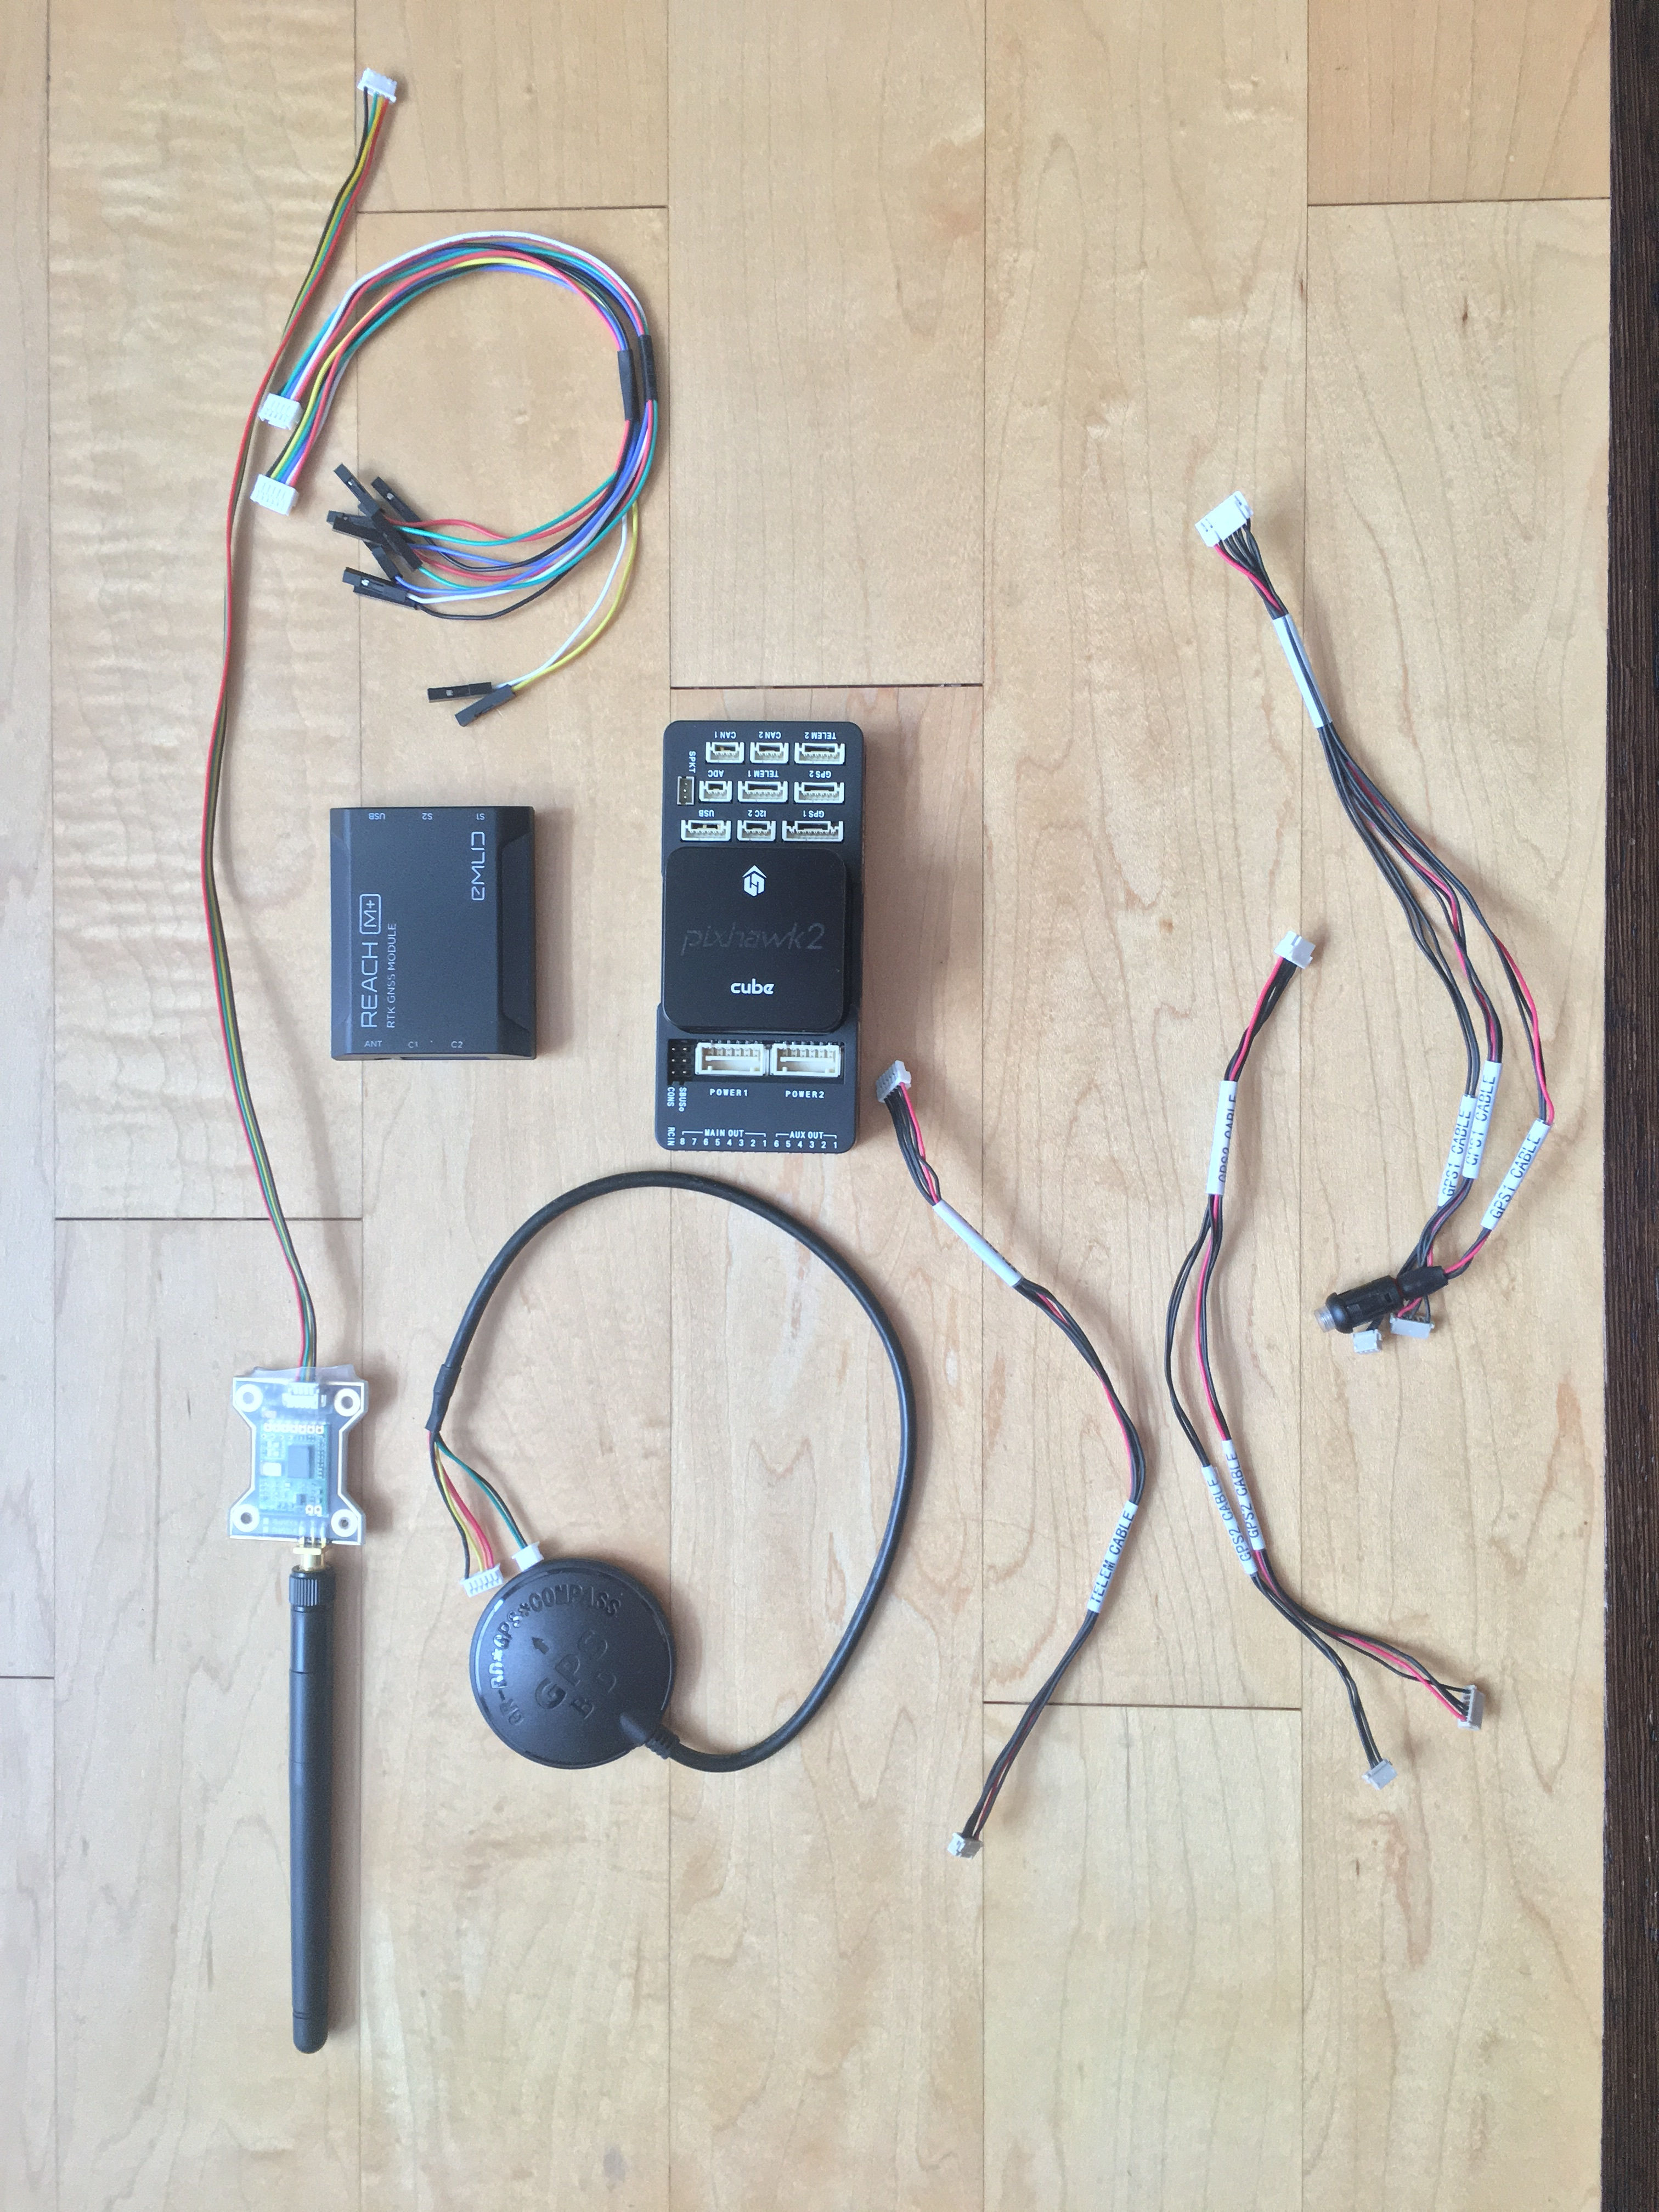 Pixhawk 2 1 Cube / Reach M+ RTK / RTK / Ublox NEO-M8N